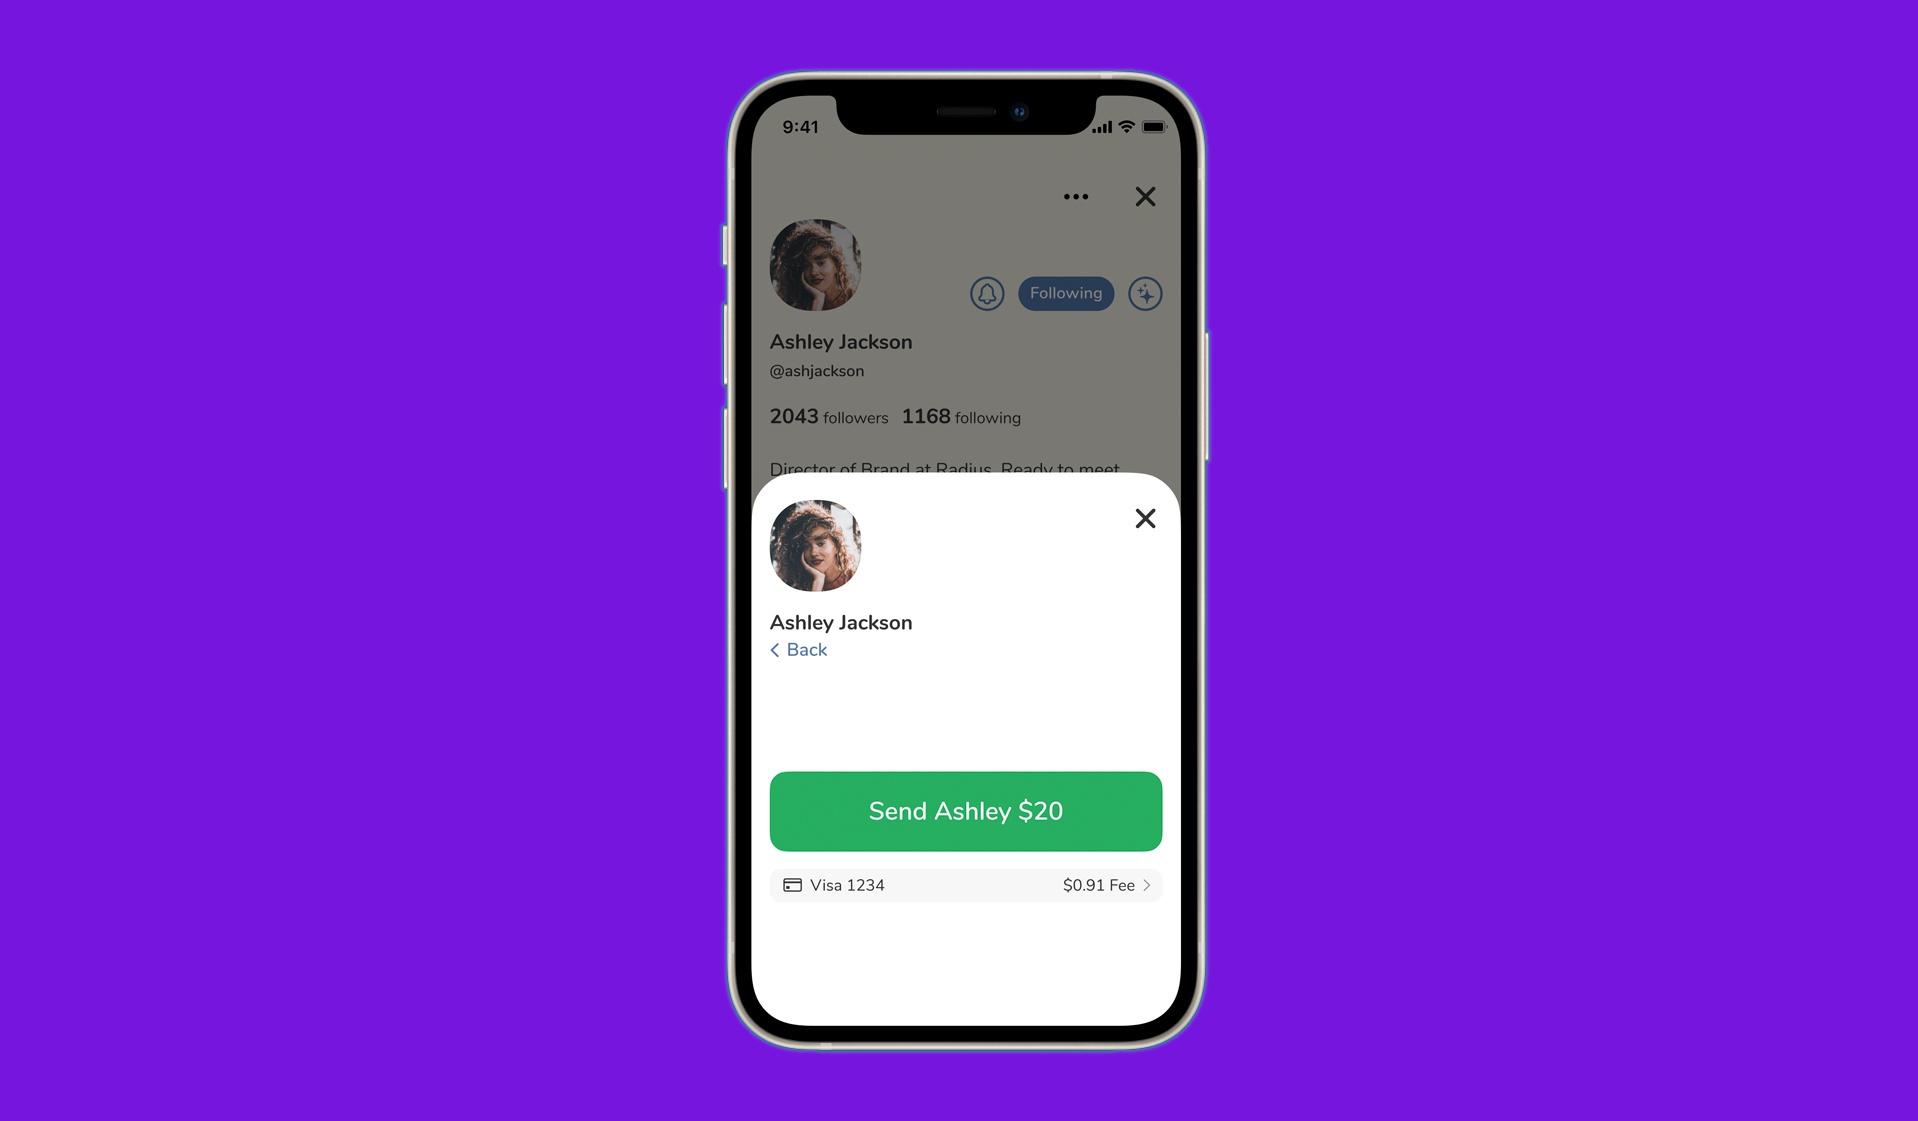 کلابهاوس قابلیت کمک مالی به محتواسازان را به اپلیکیشن خود اضافه کرد